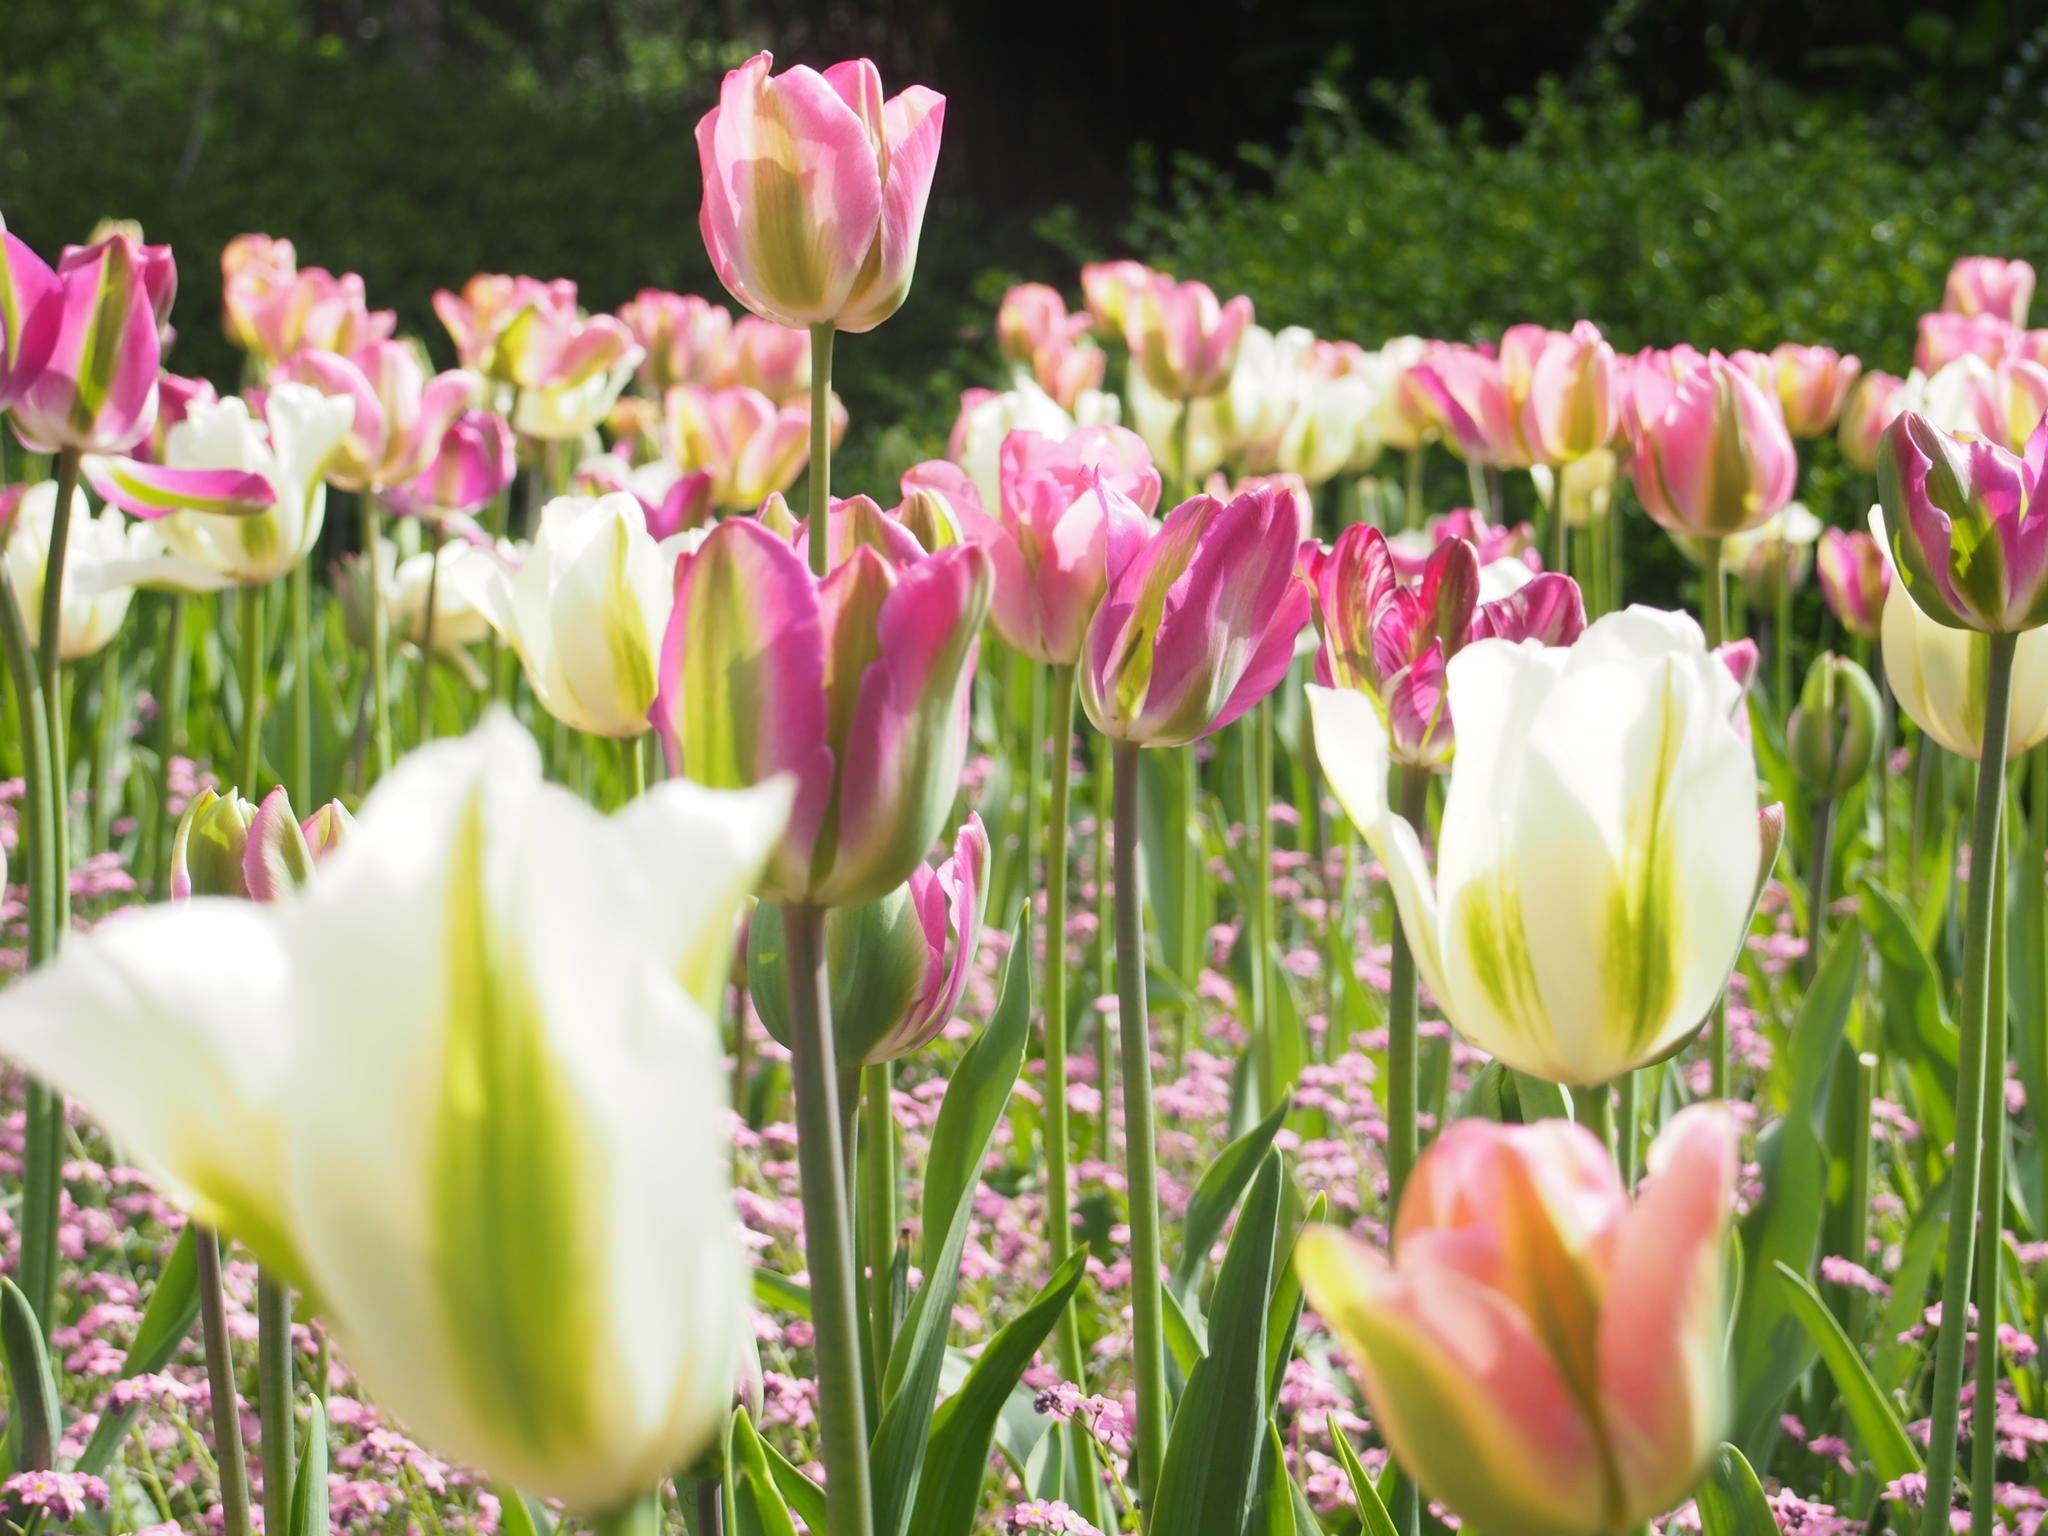 Belgian Gardens by Grant Shepherd on 500px